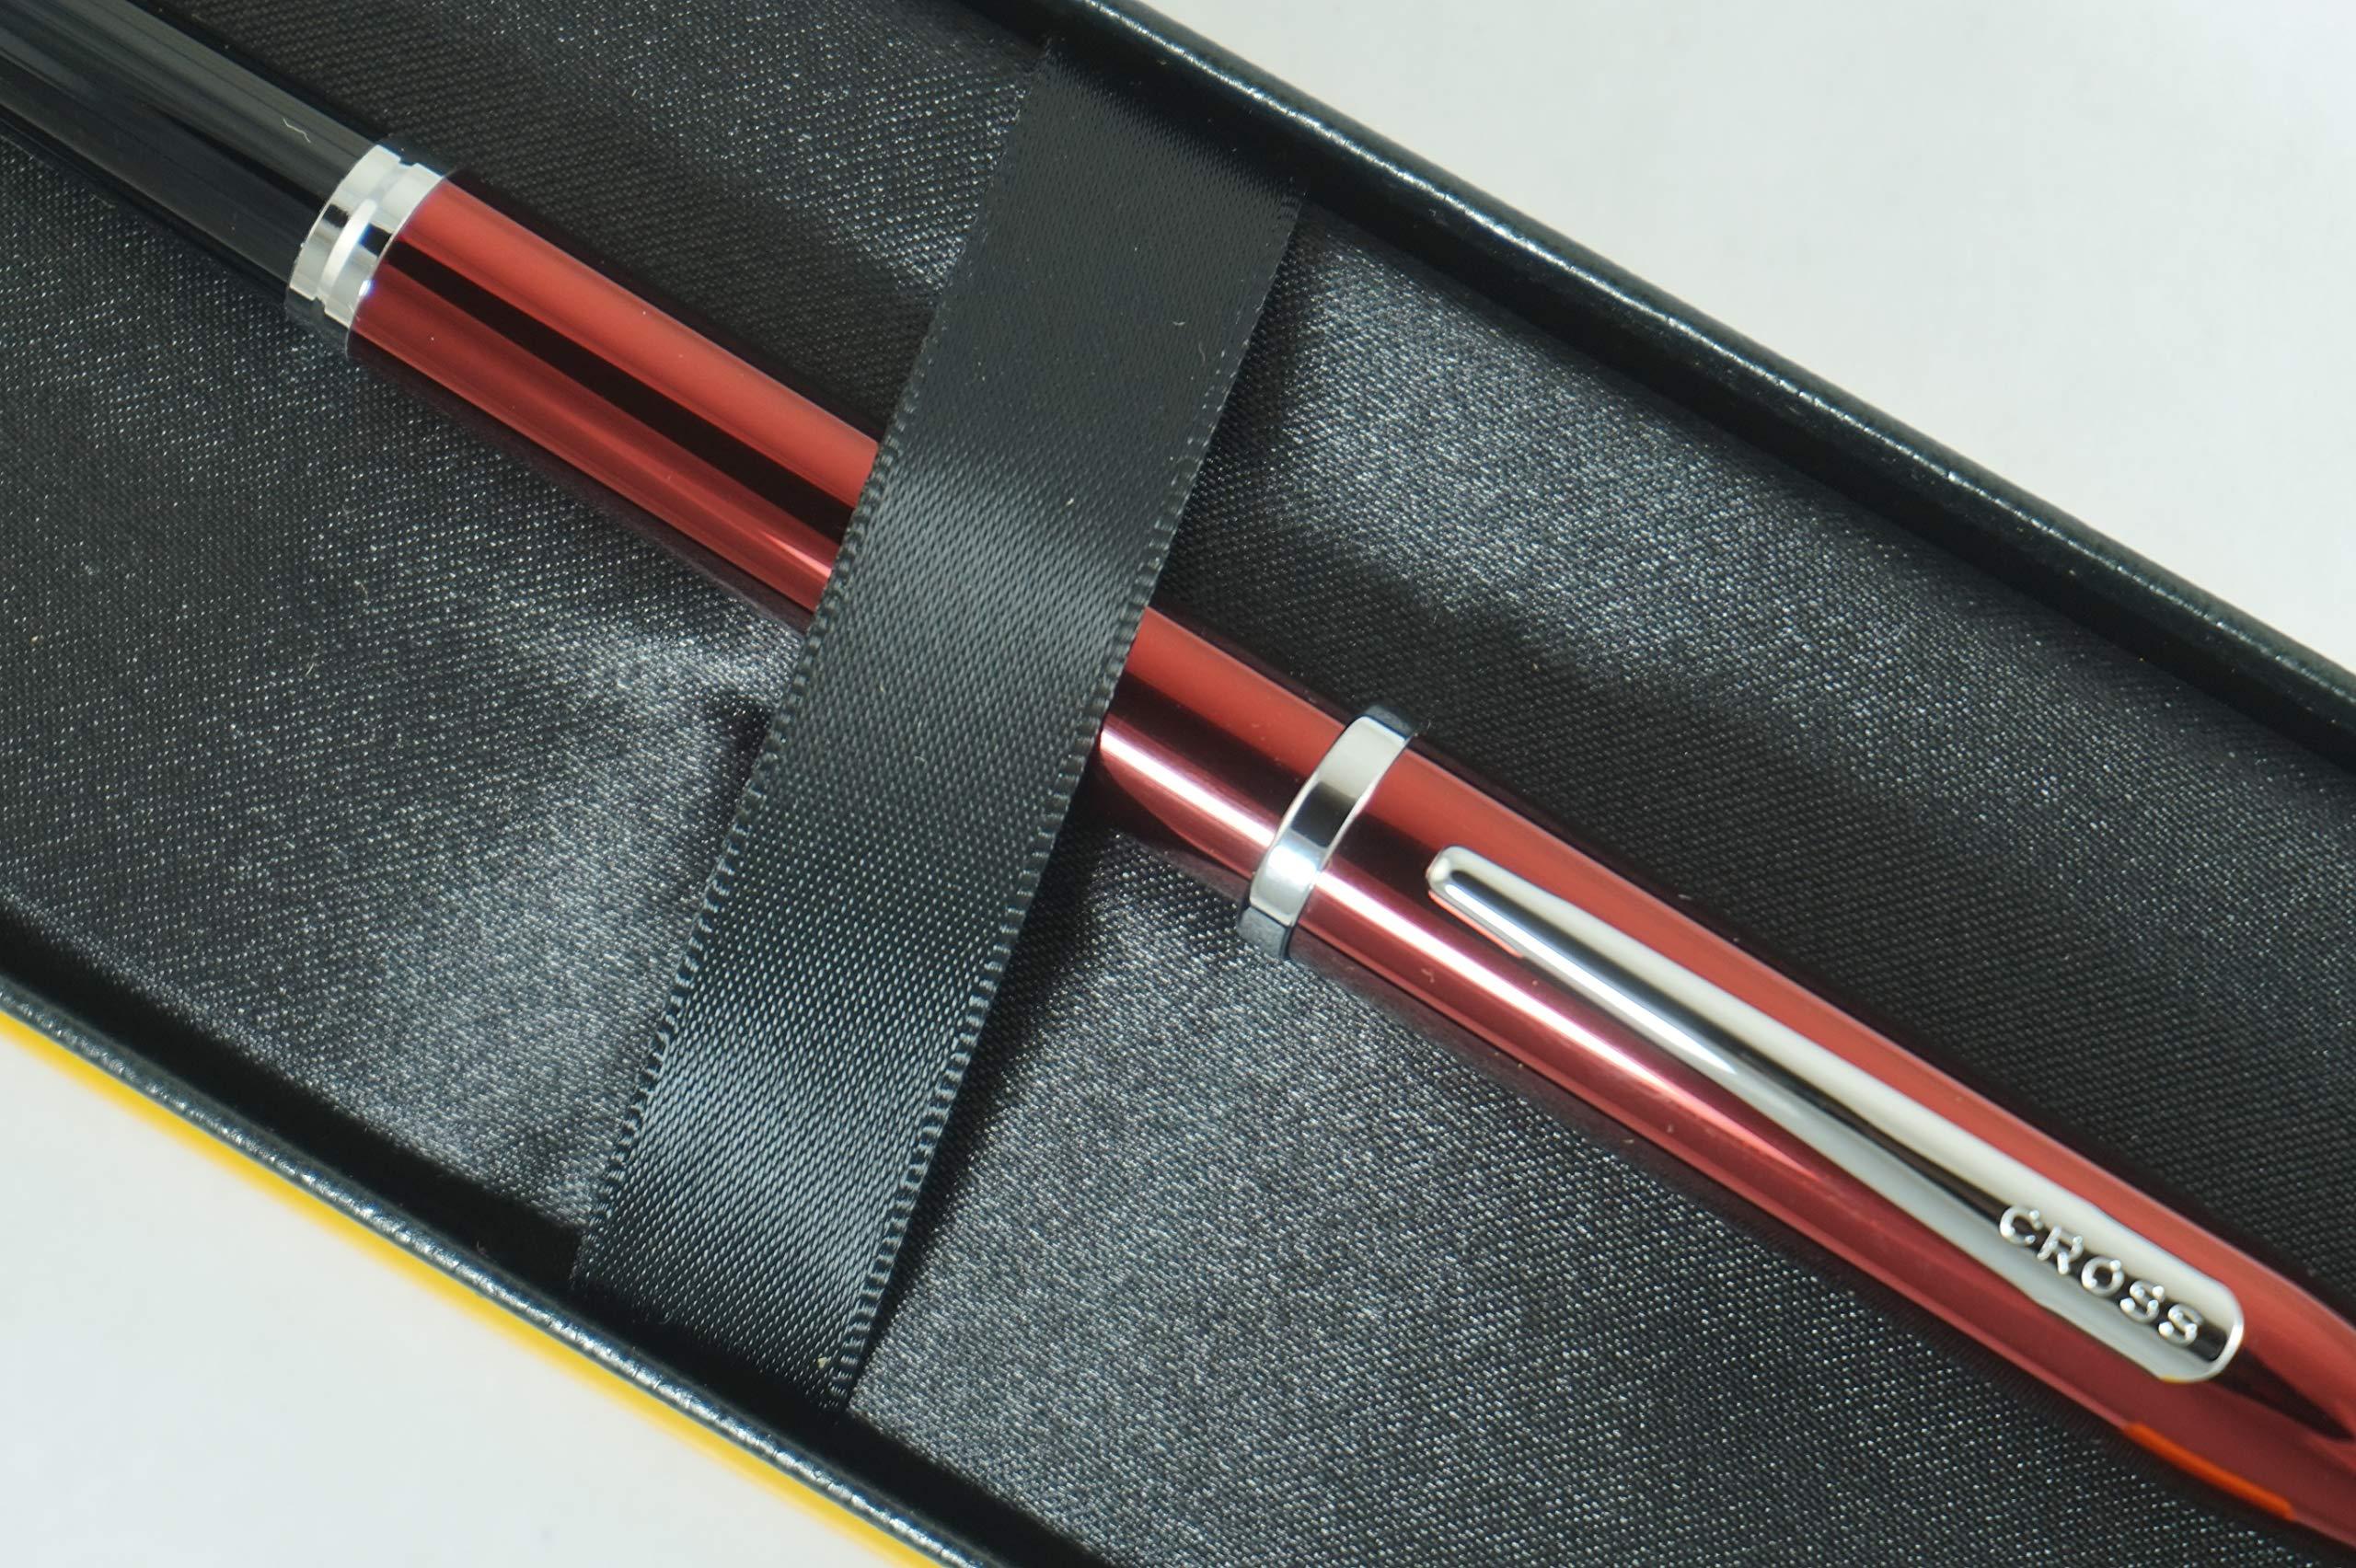 Cross Century II Limited Series, Pearlescent Metallic Ruby Red selectip Gel Ink Rollerball Pen